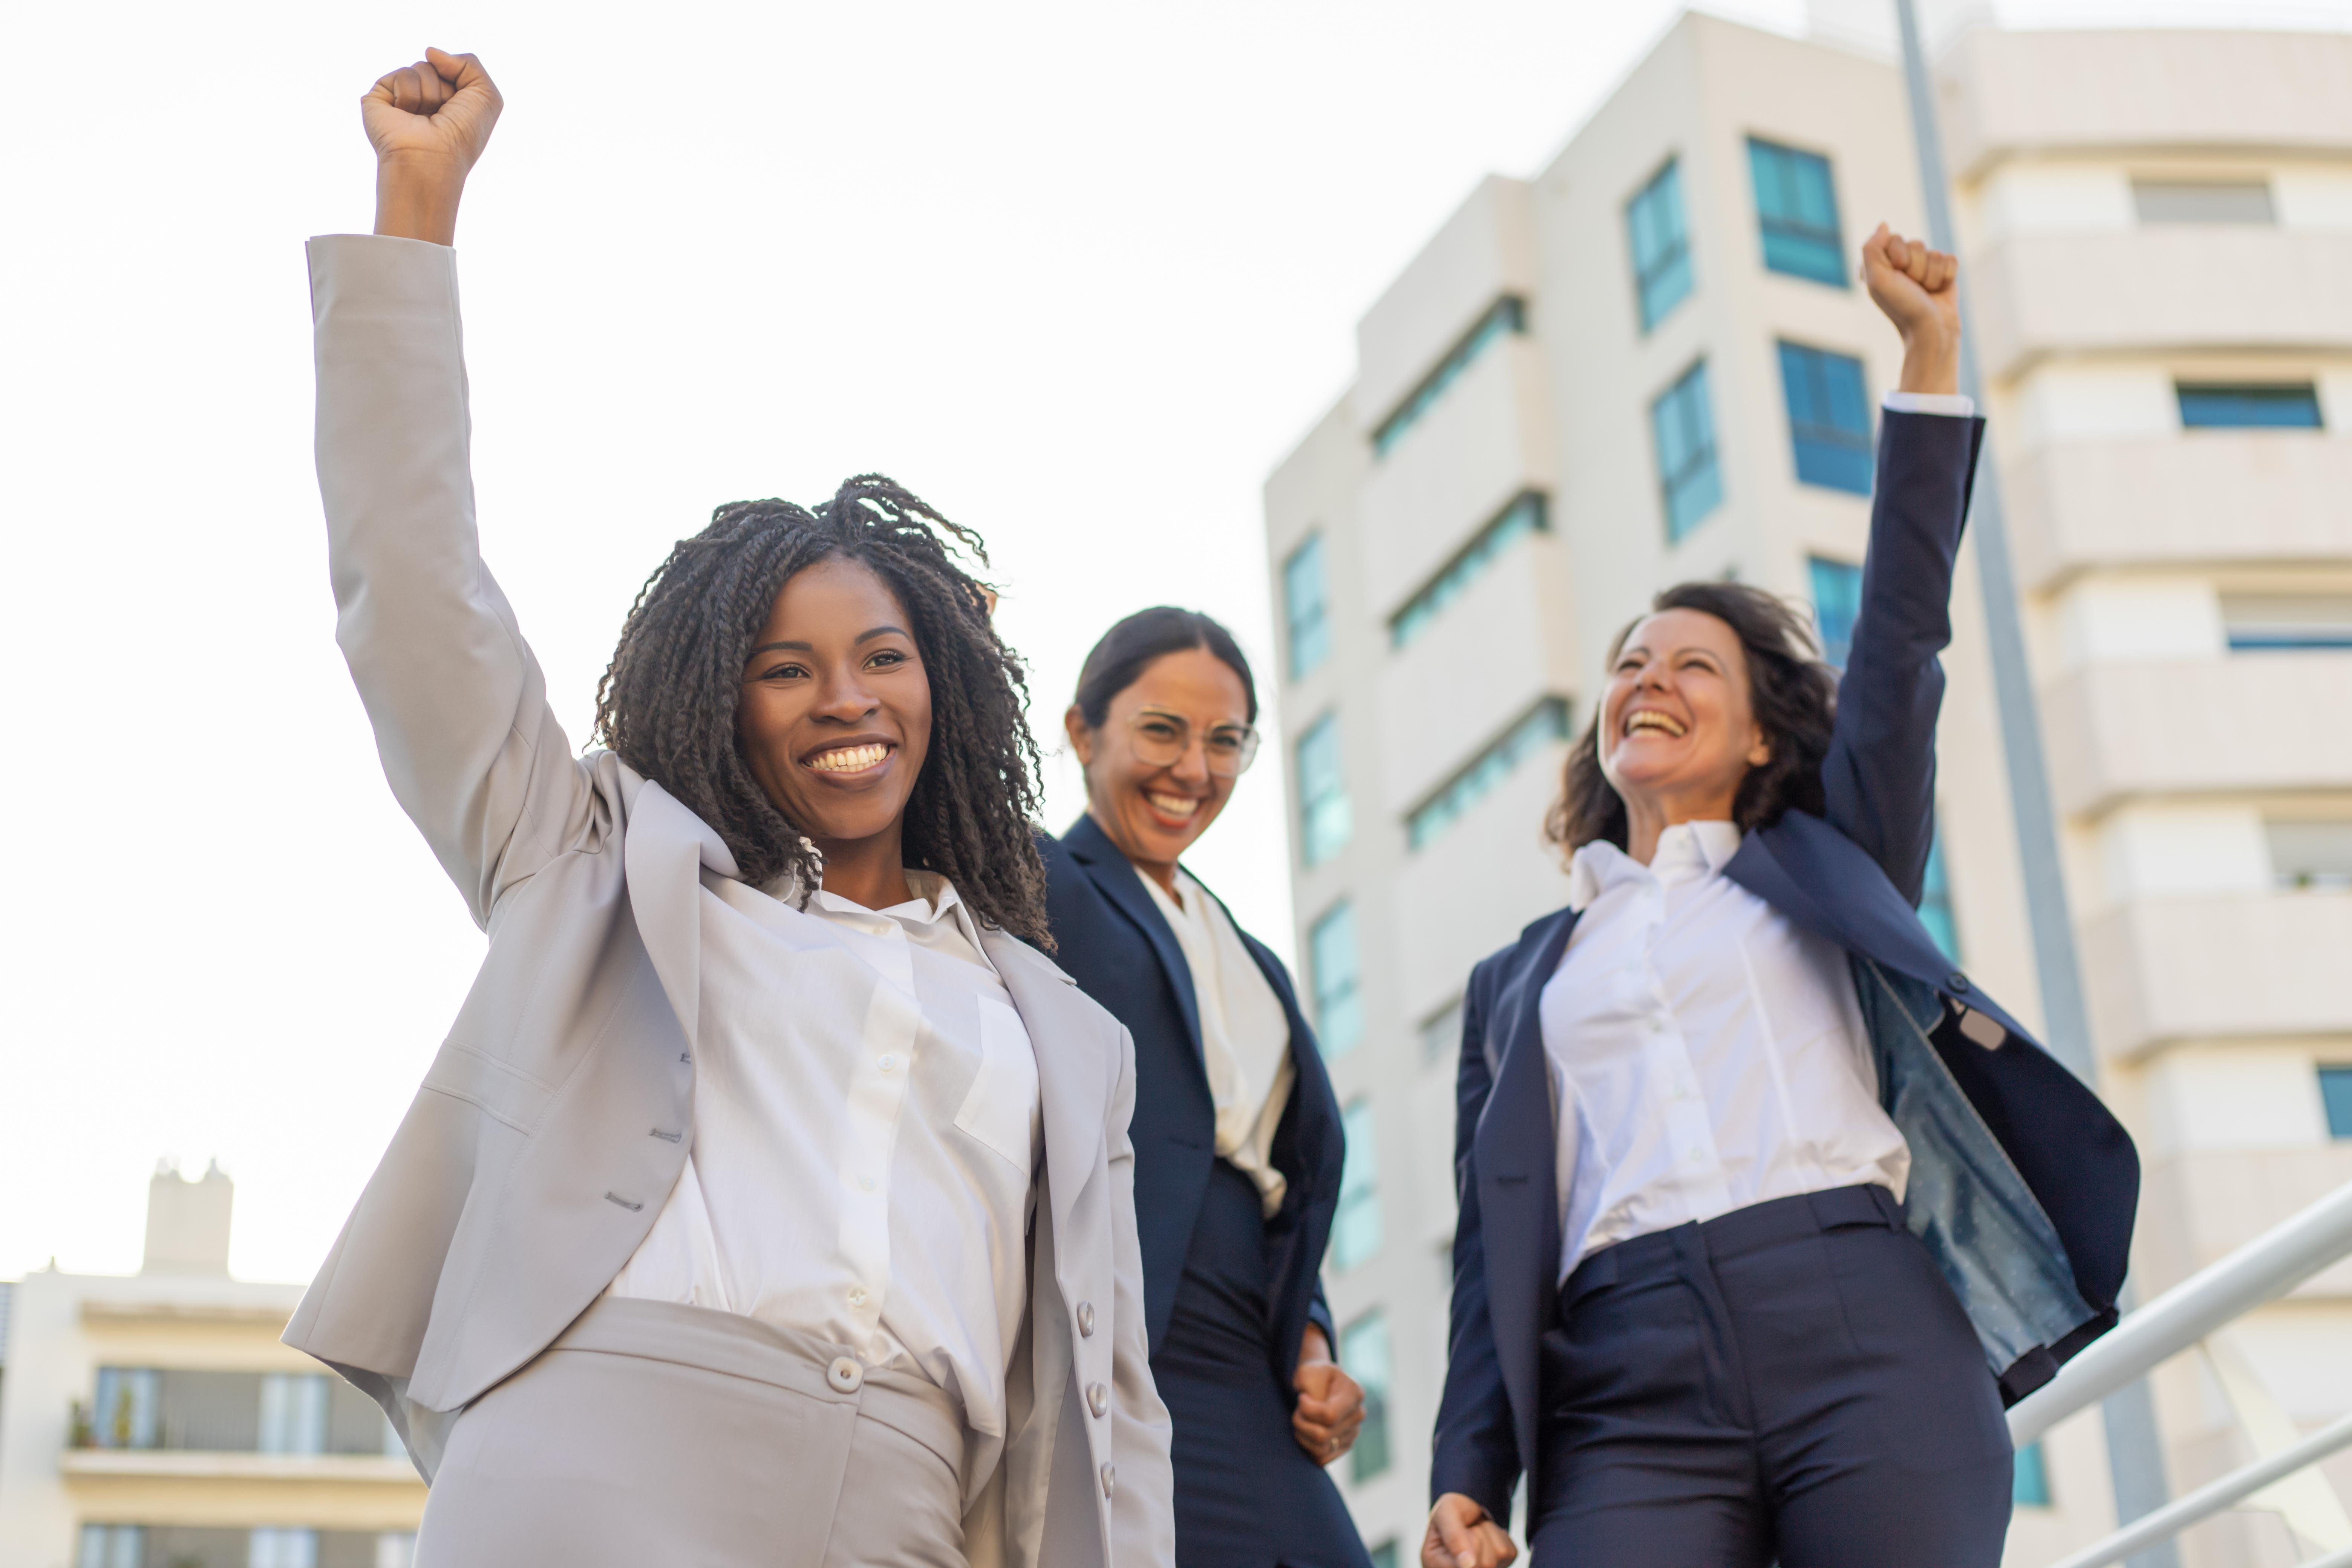 Ninglethorton Management Solutions on Paving the Way Toward Financial Freedom